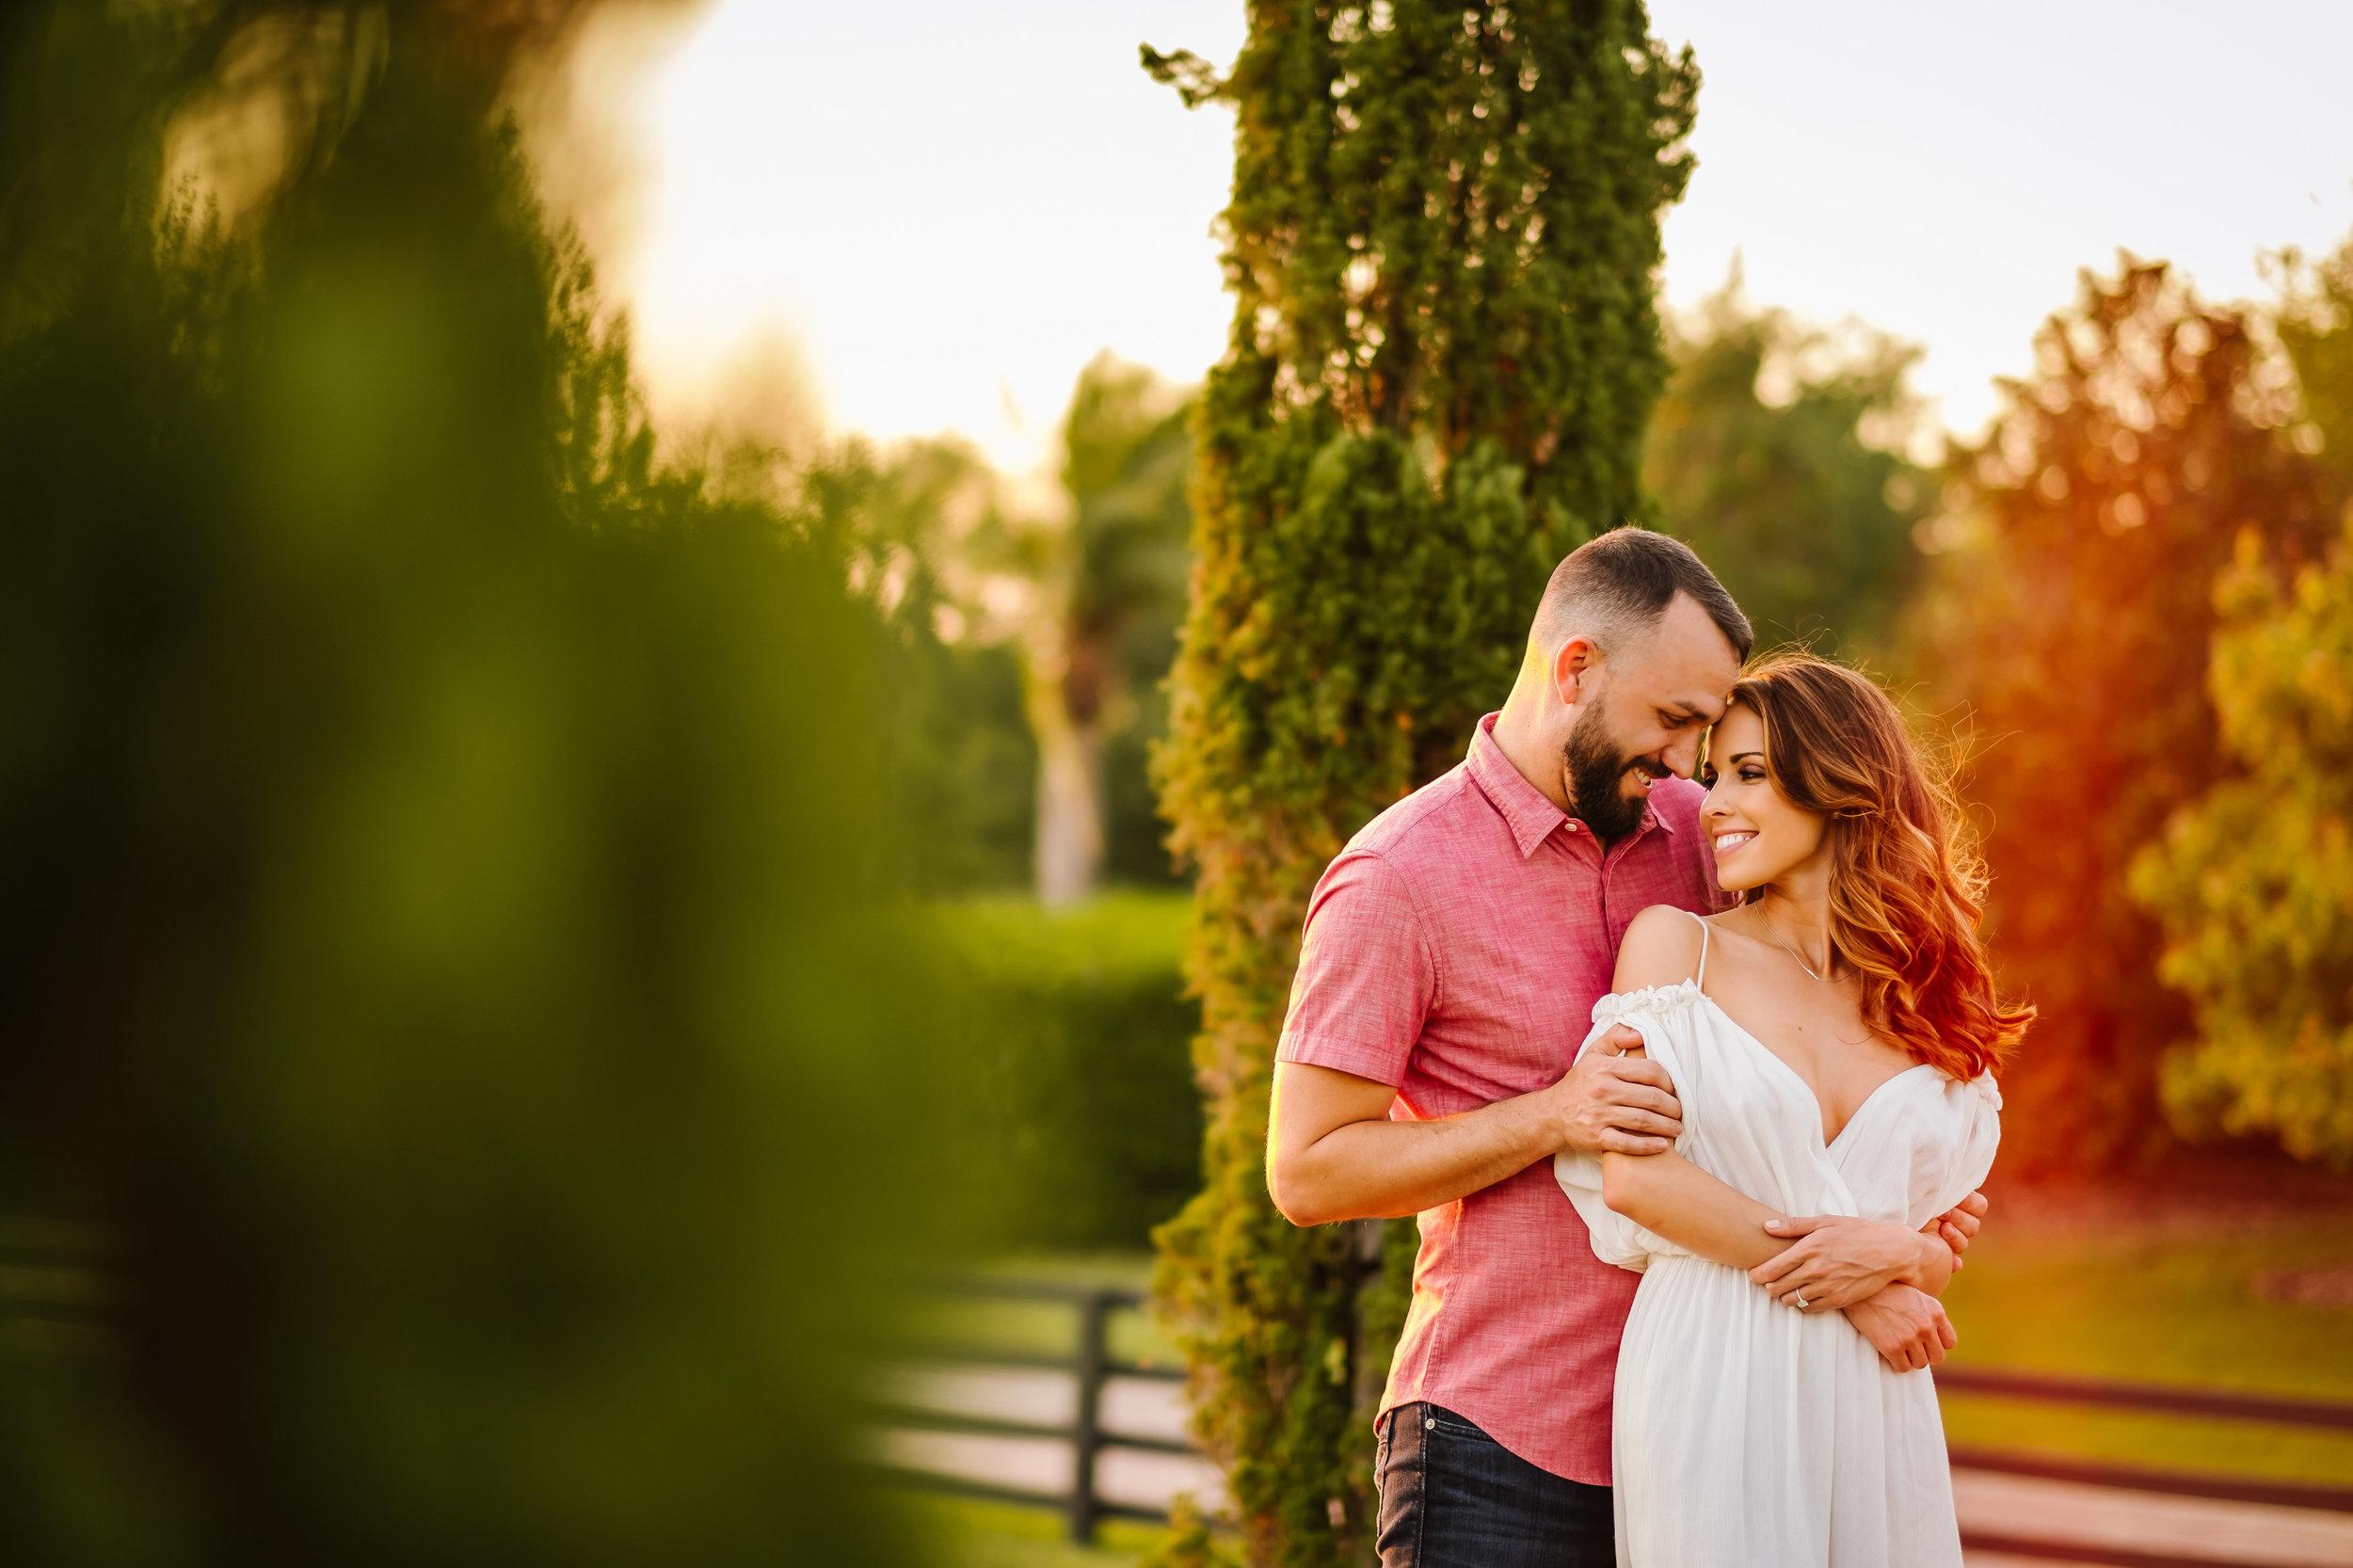 Tampa-Engagement-Photographer-Luxury-Estate-Florida-Romantic.jpg